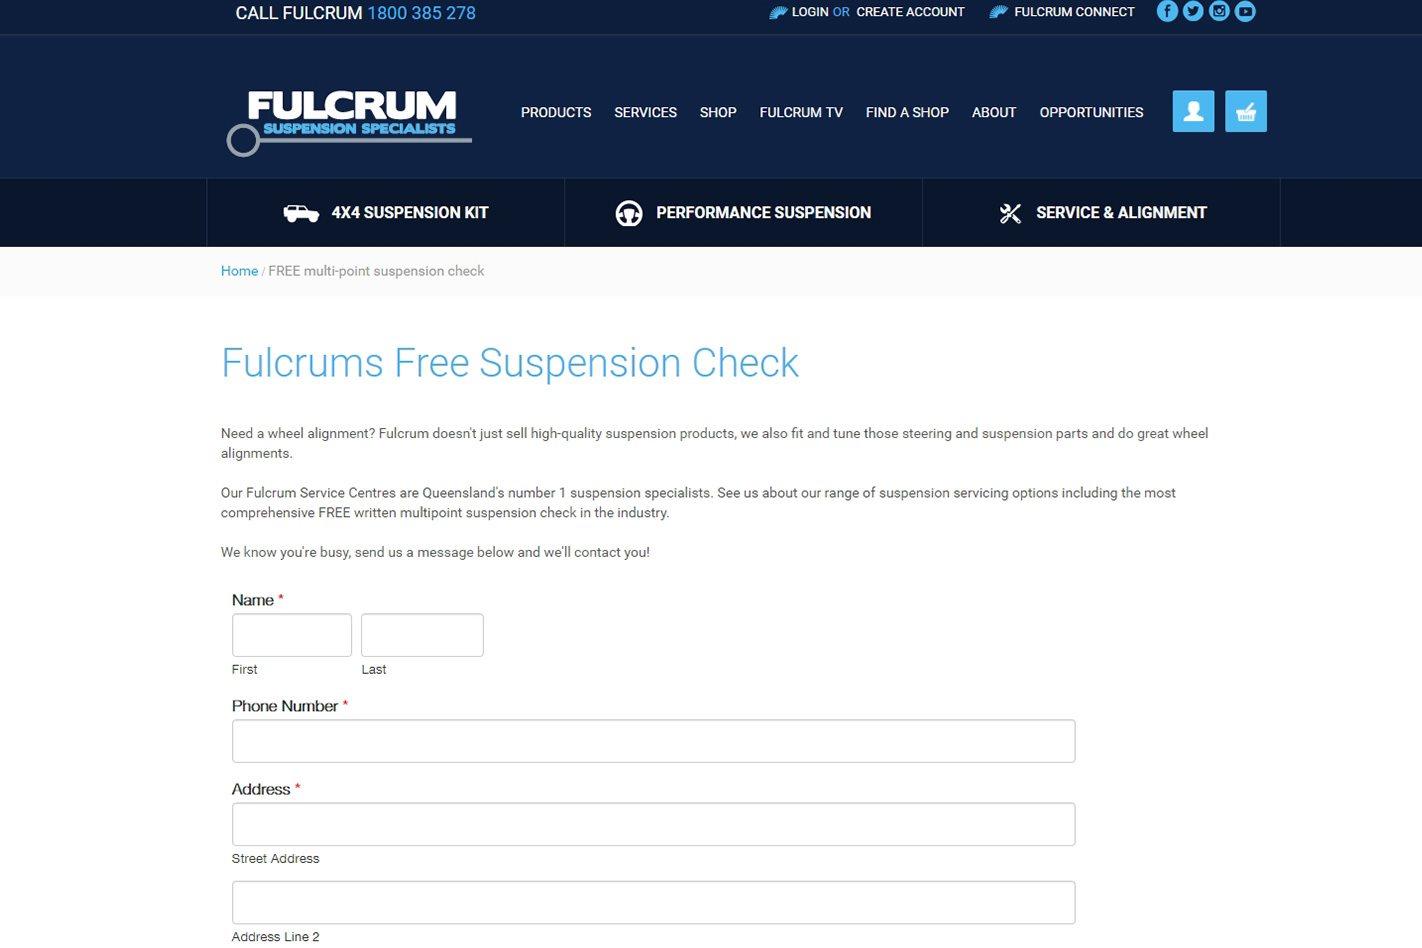 Fulcrum's free suspension check